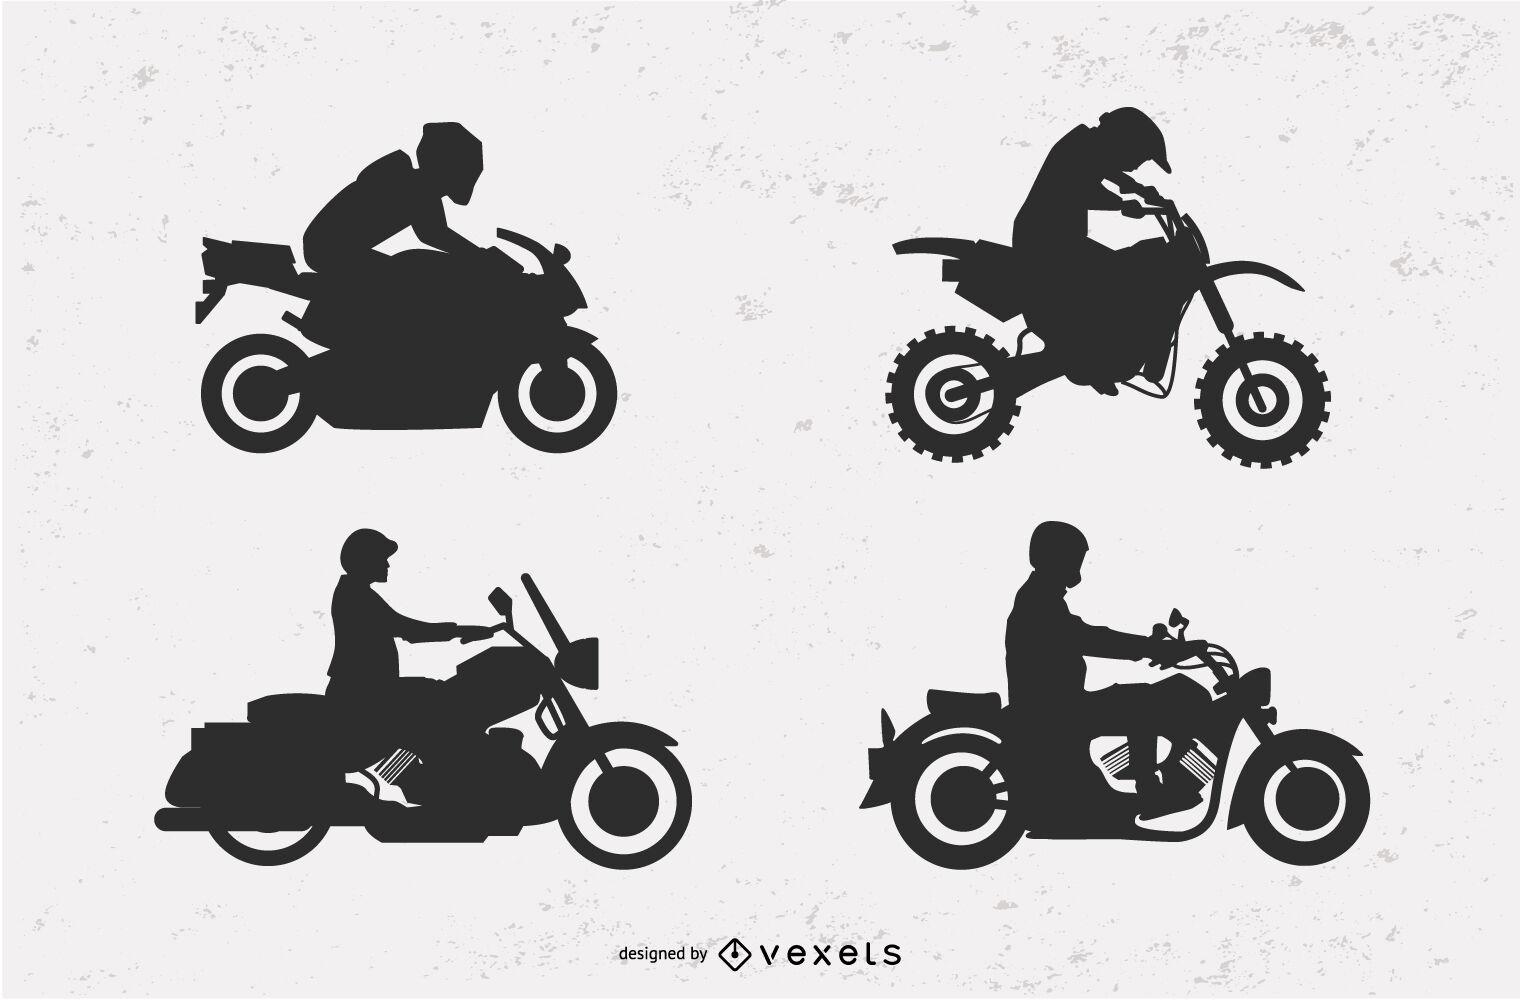 Motorcycle silhouette illustration set